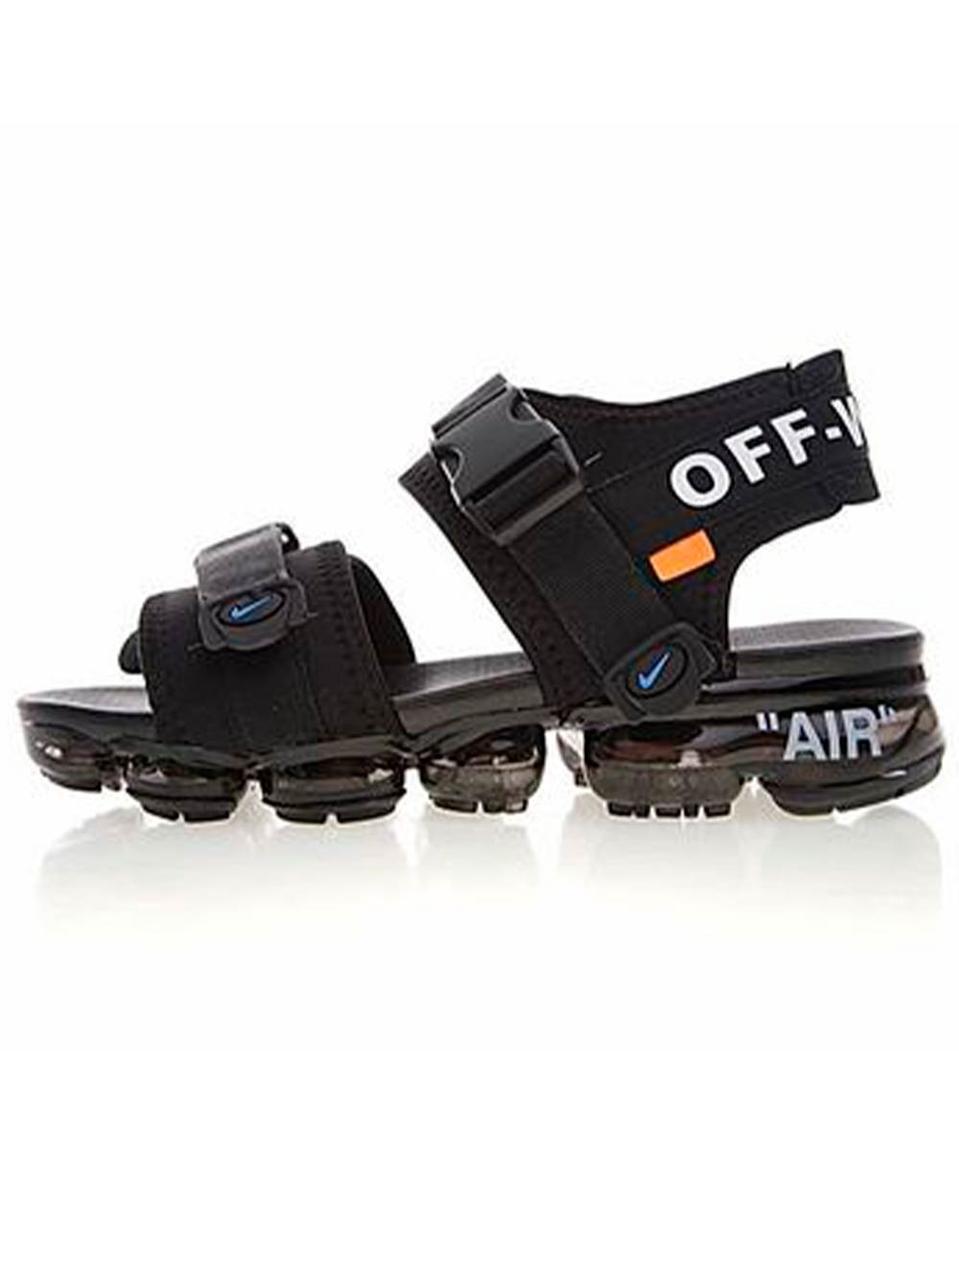 d70c117e0dce Мужские сандалии Nike Air Vapormax Sandals x Off White x Black